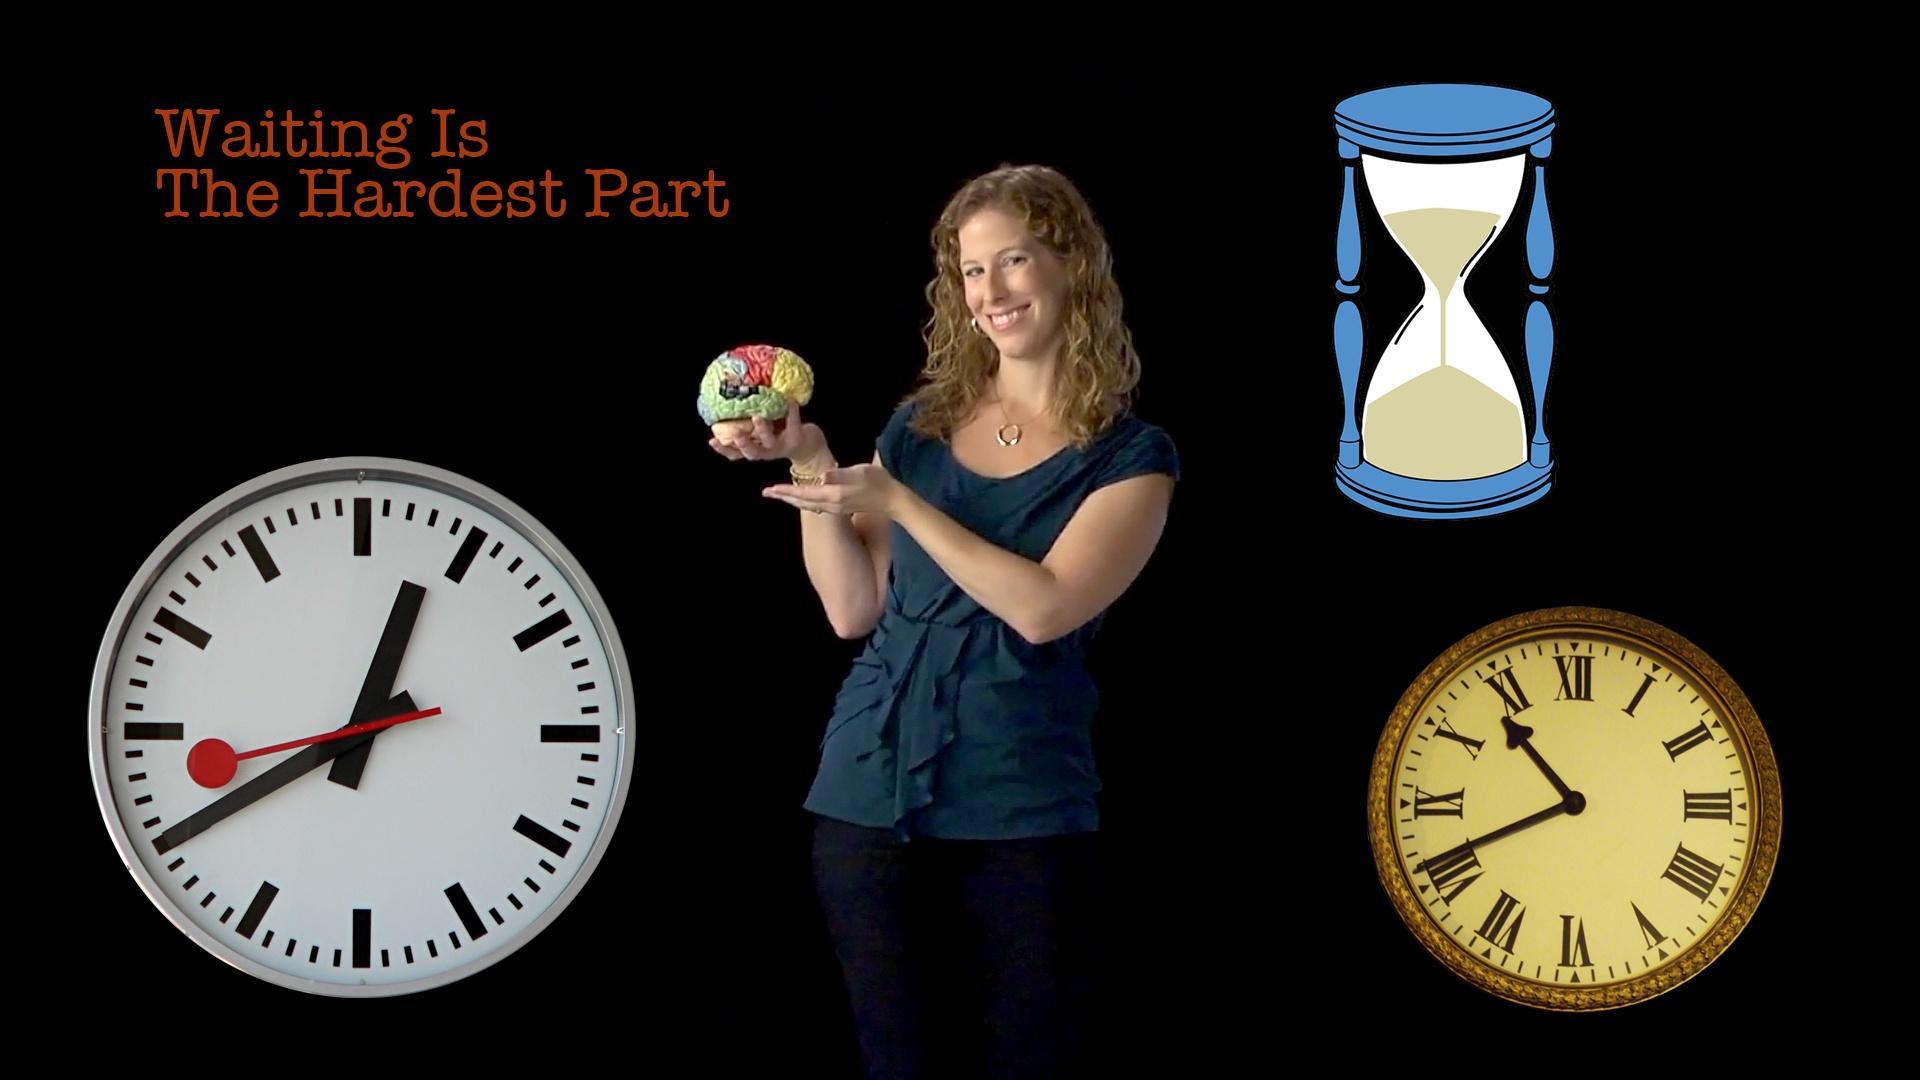 Kate Sweeny: Waiting Is The Hardest Part image